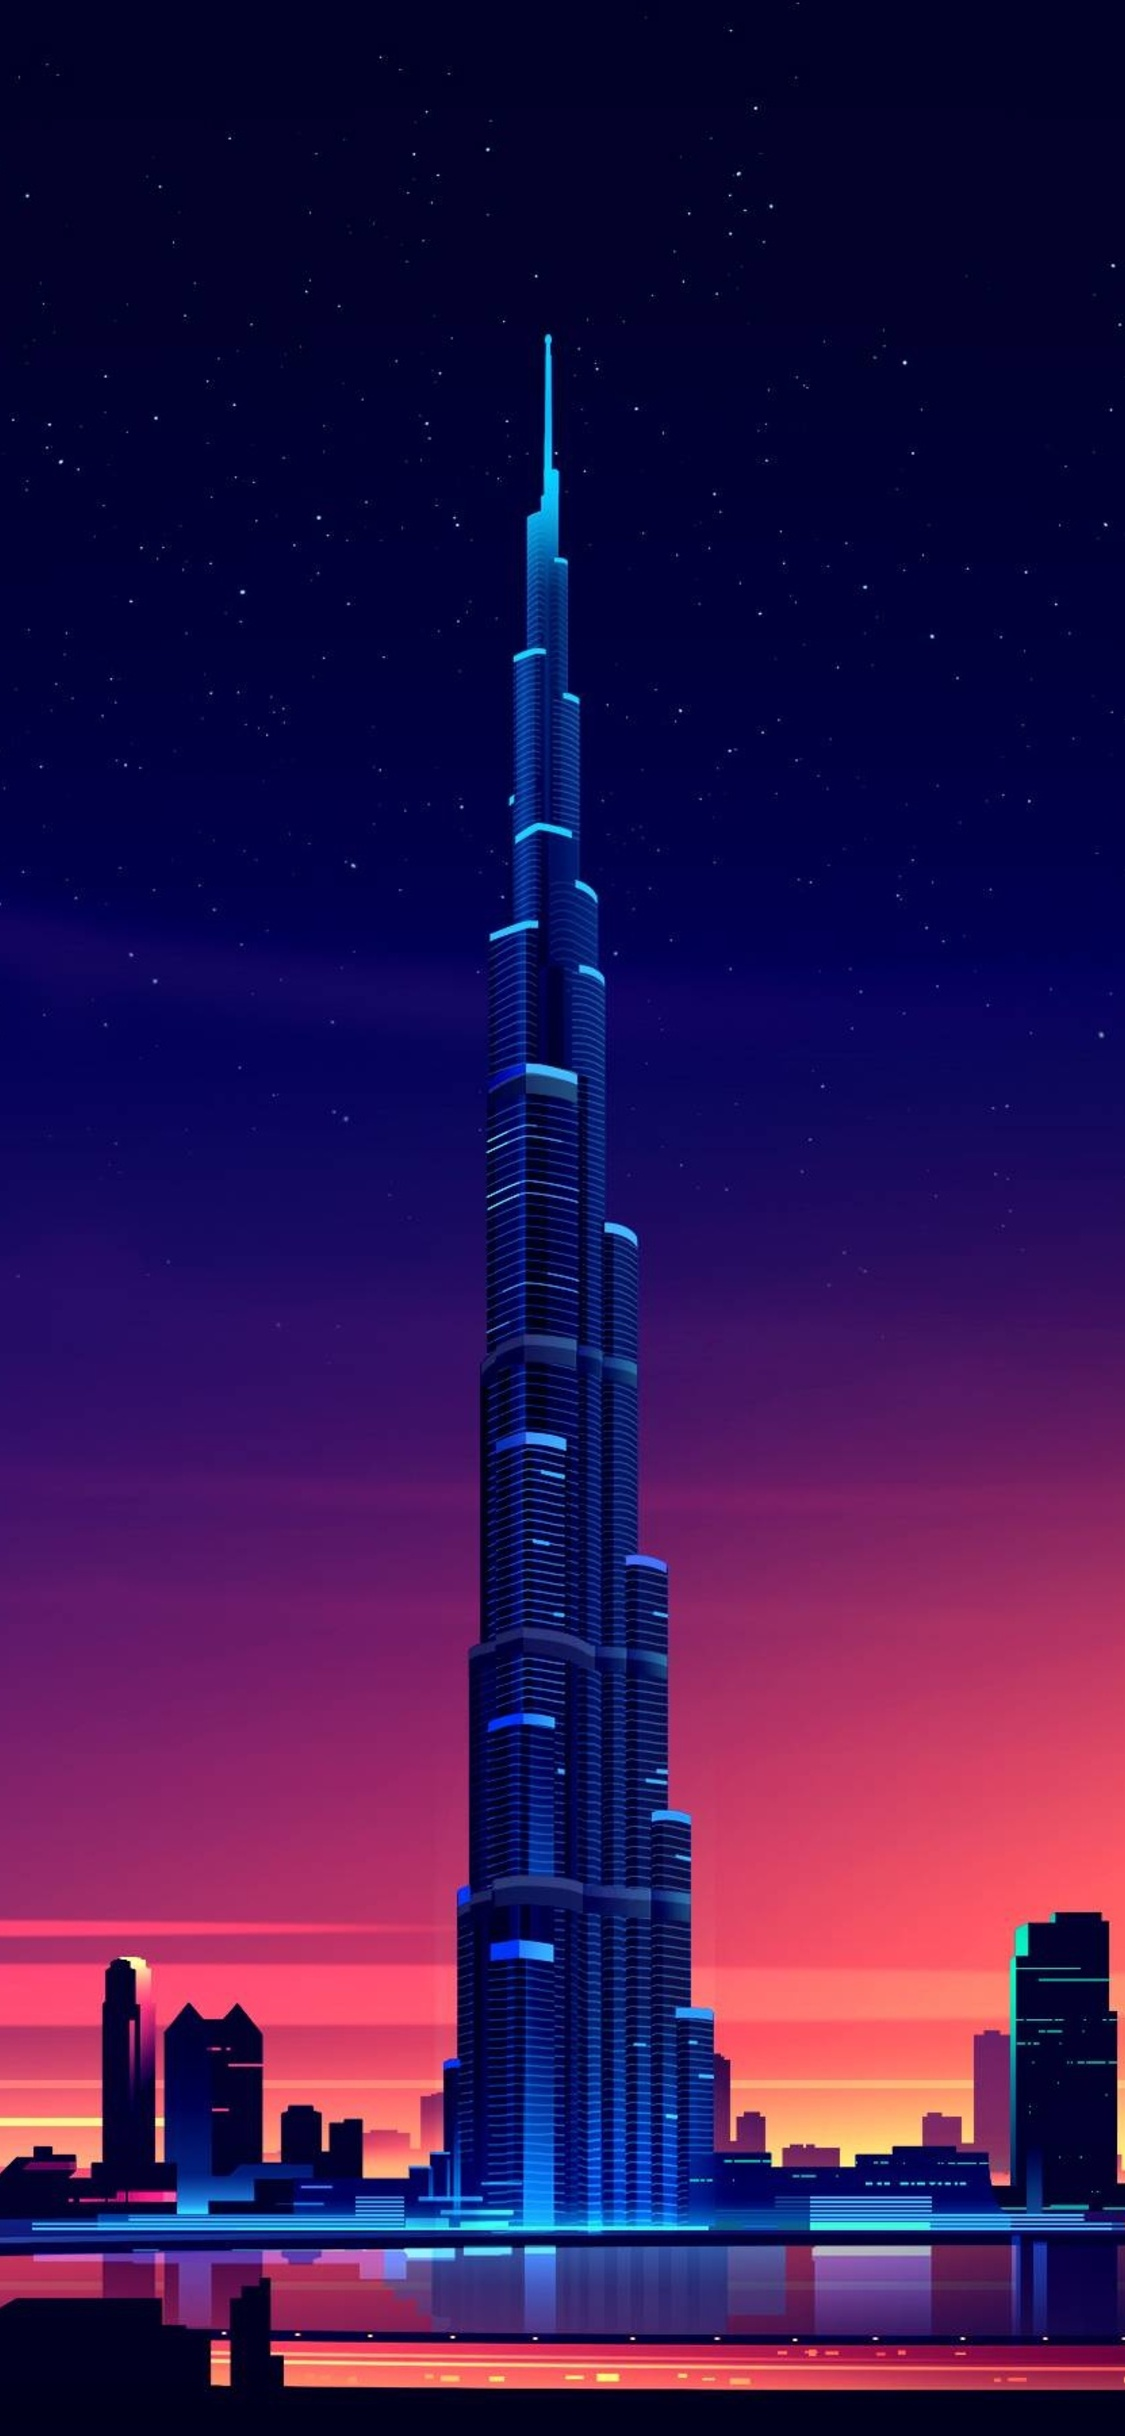 1125x2436 dubai burj khalifa minimalist iphone xs iphone 10 iphone x hd 4k wallpapers images - Dubai burj khalifa hd photos ...